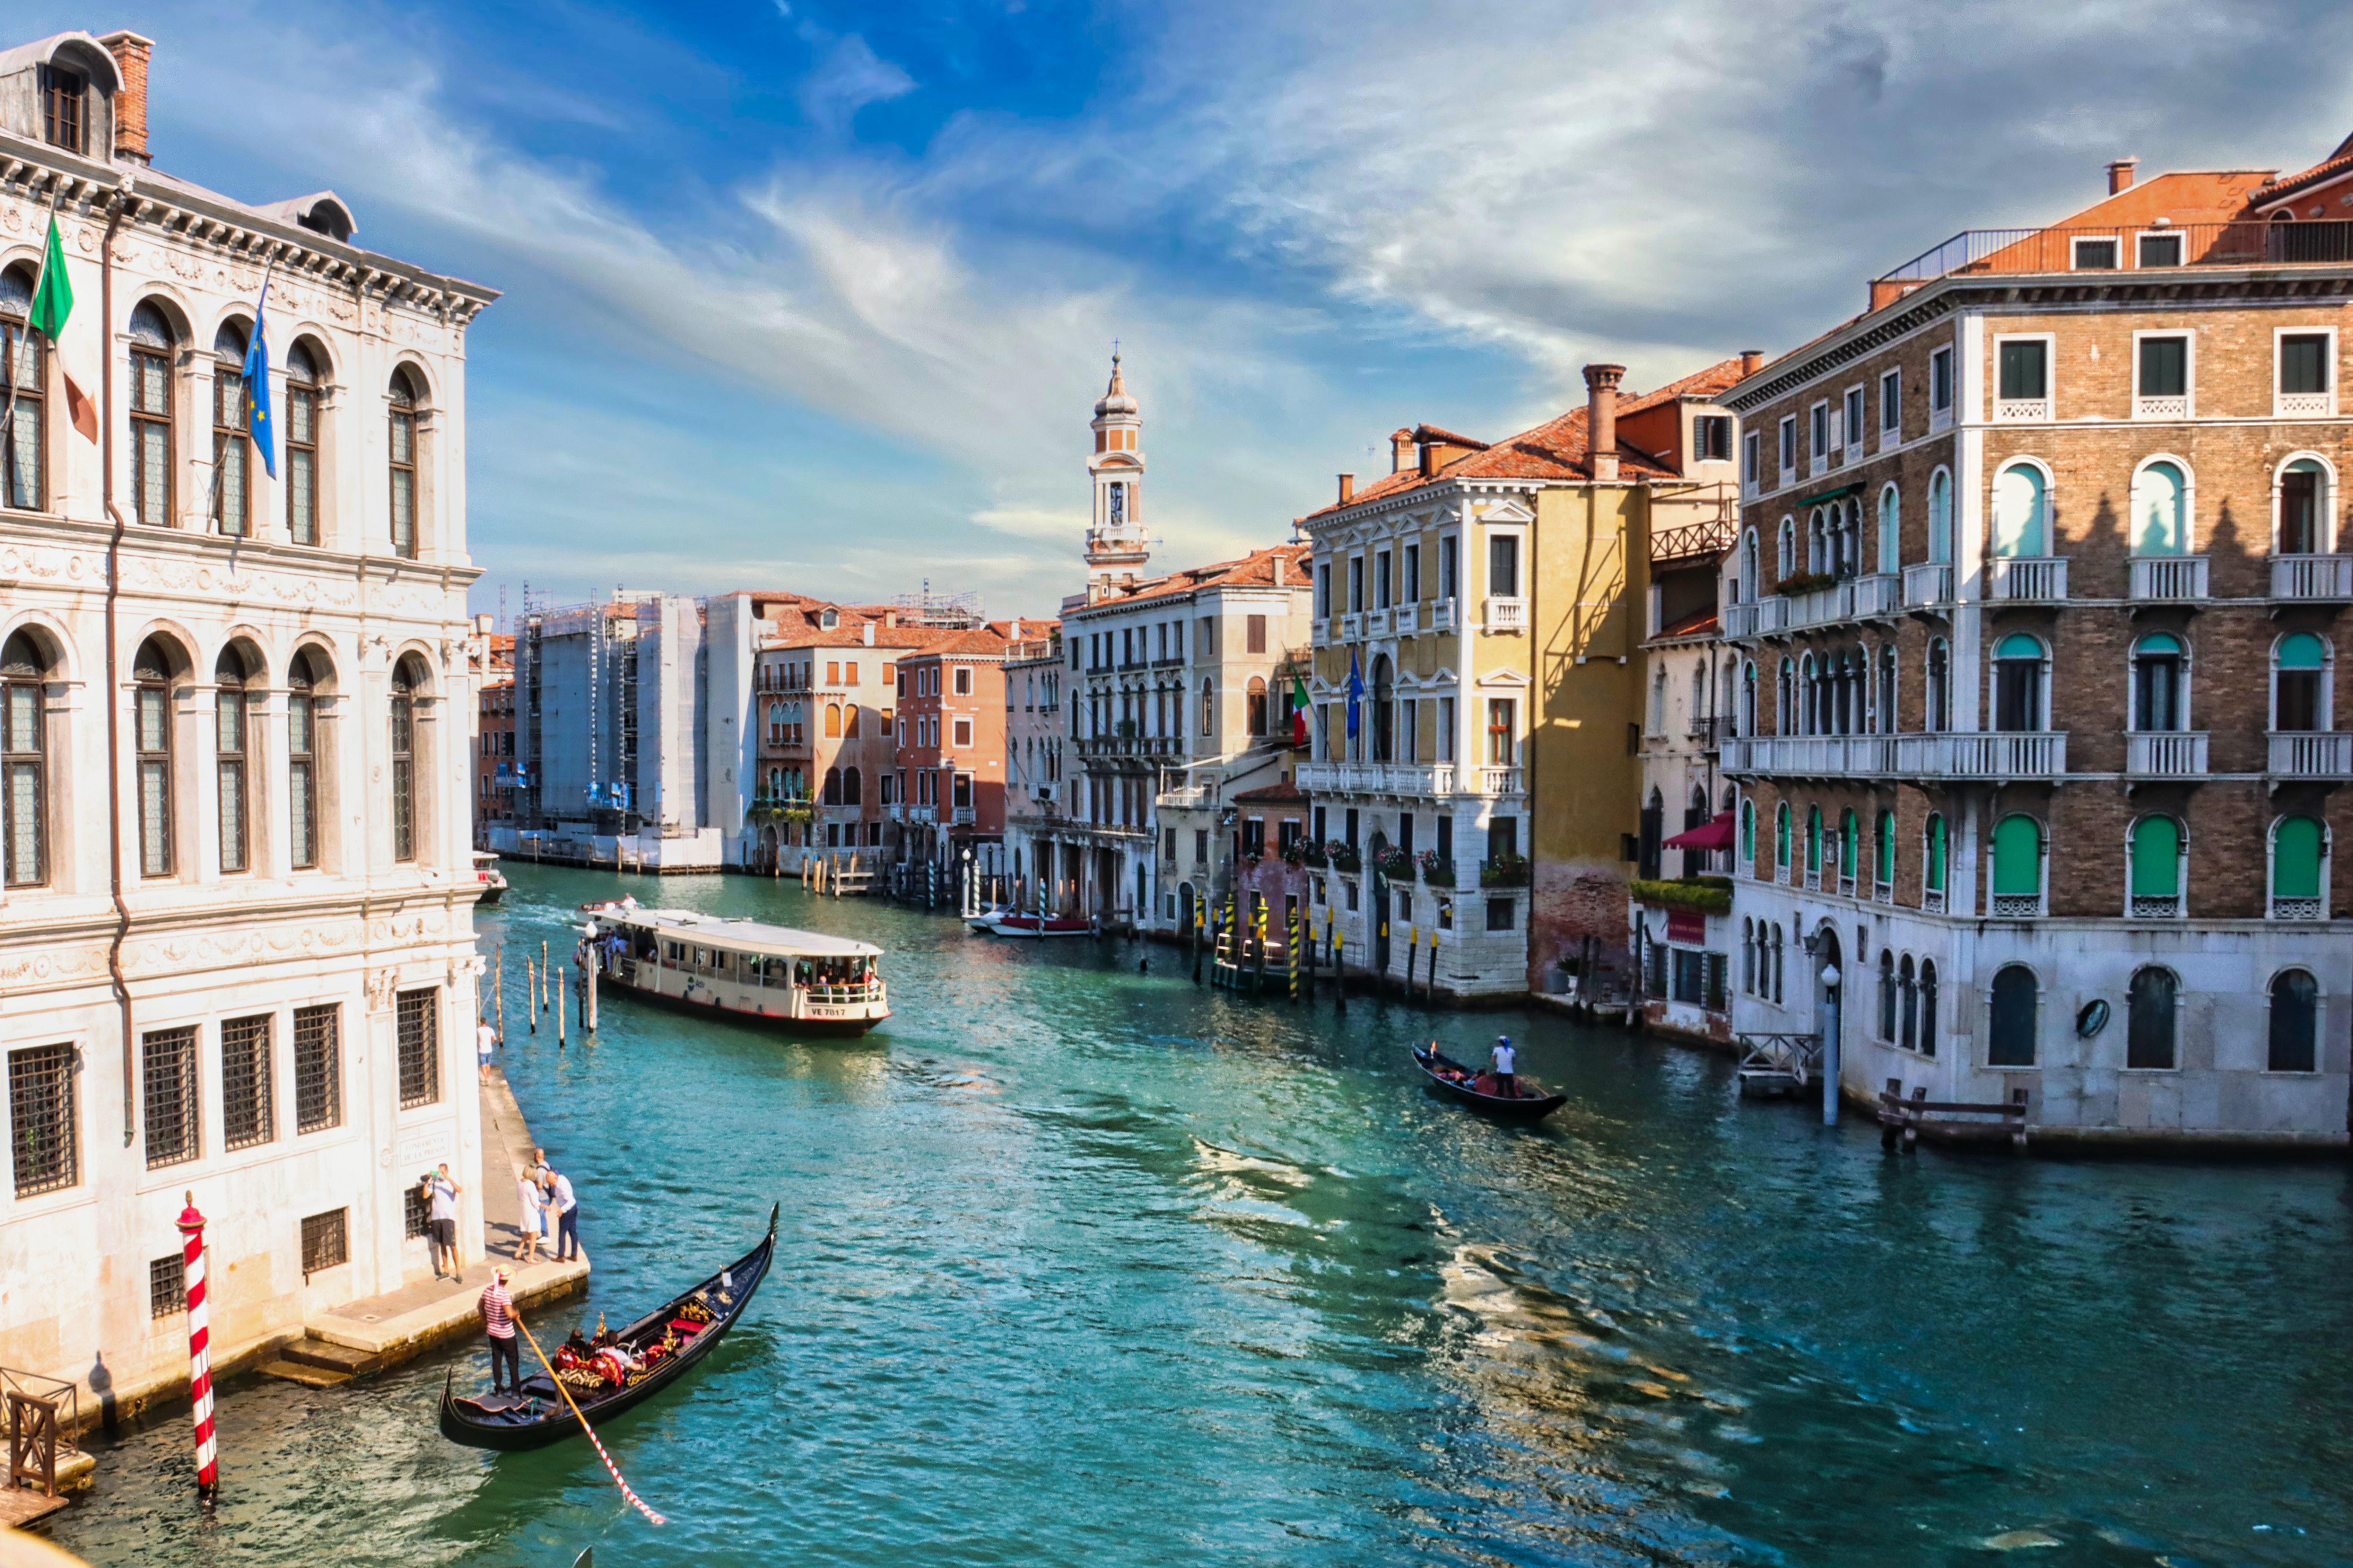 Venice, Italy Itinerary for 10 Days